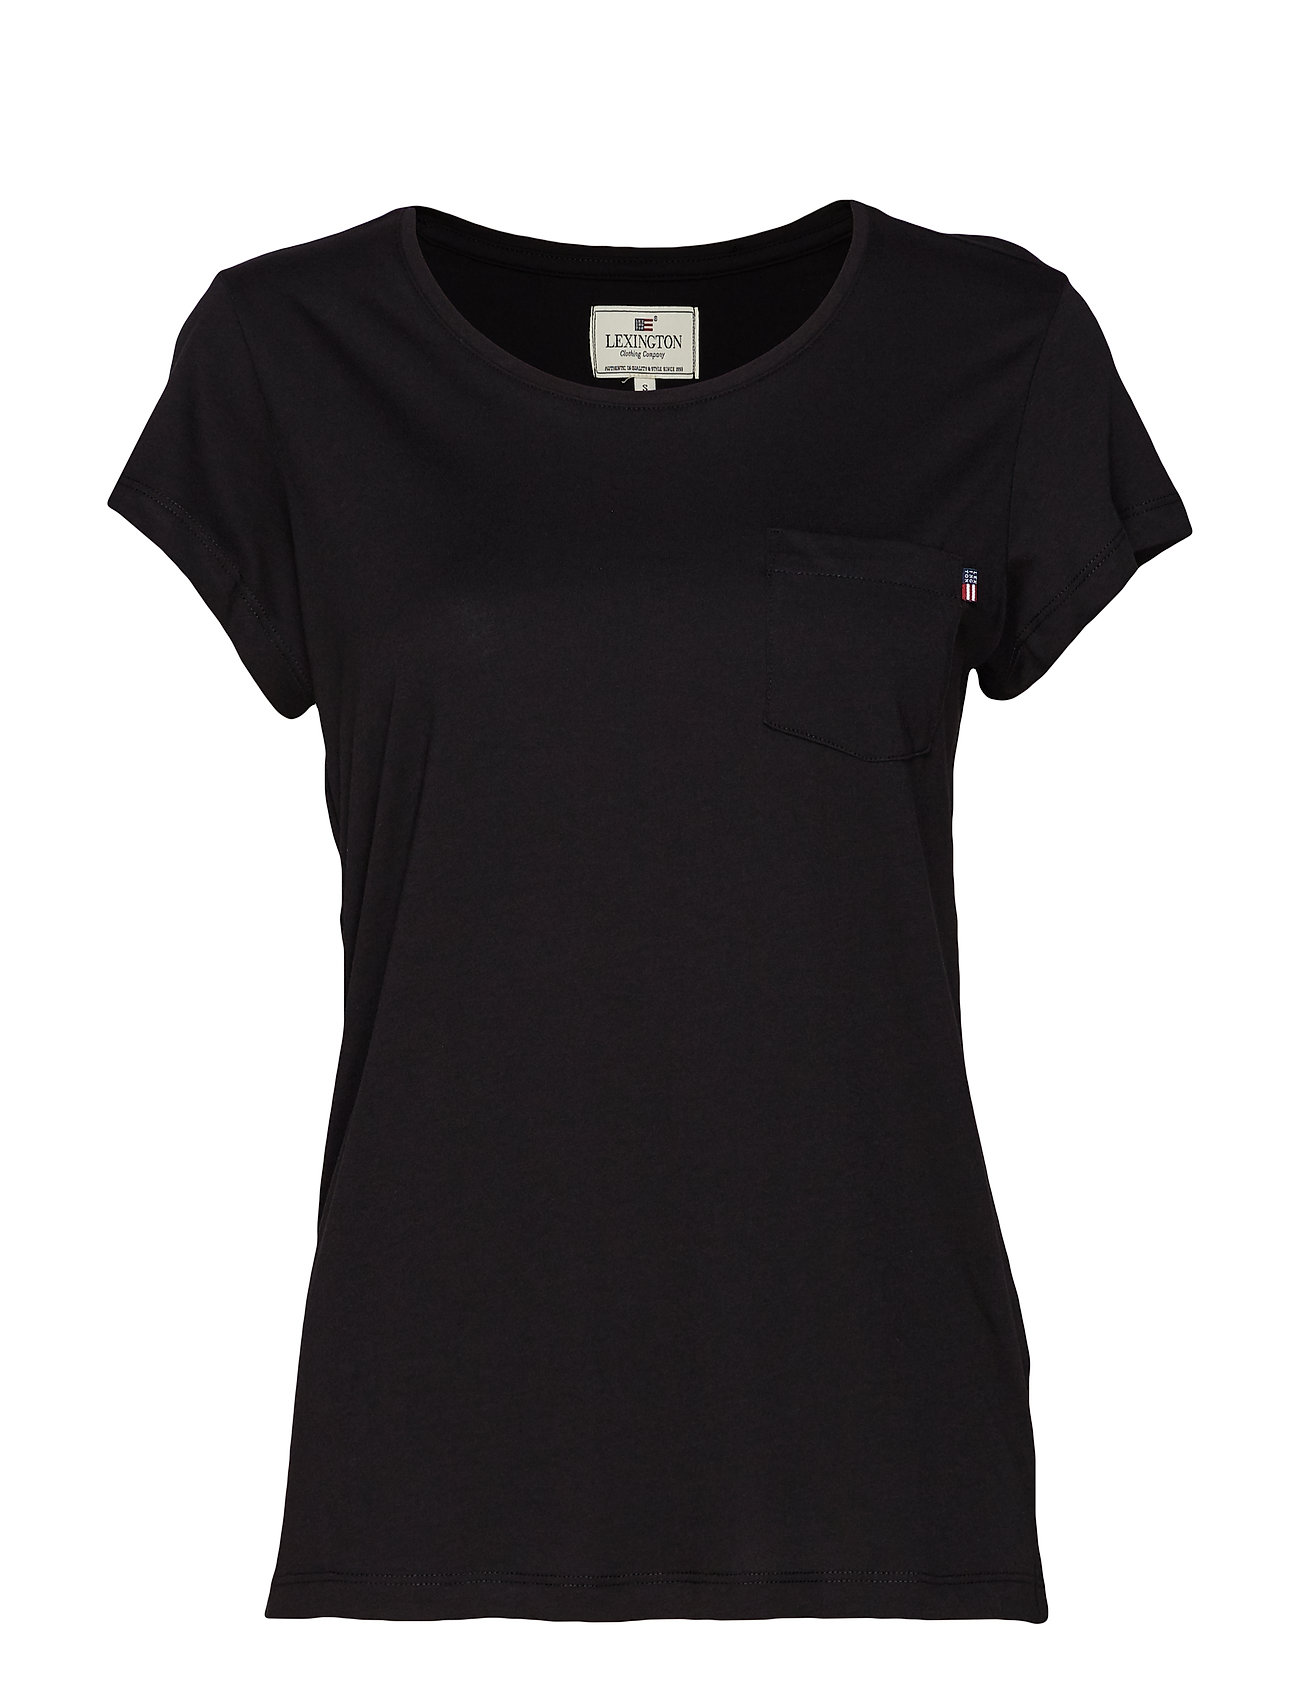 Lexington Clothing Ashley Jersey Tee - BLACK